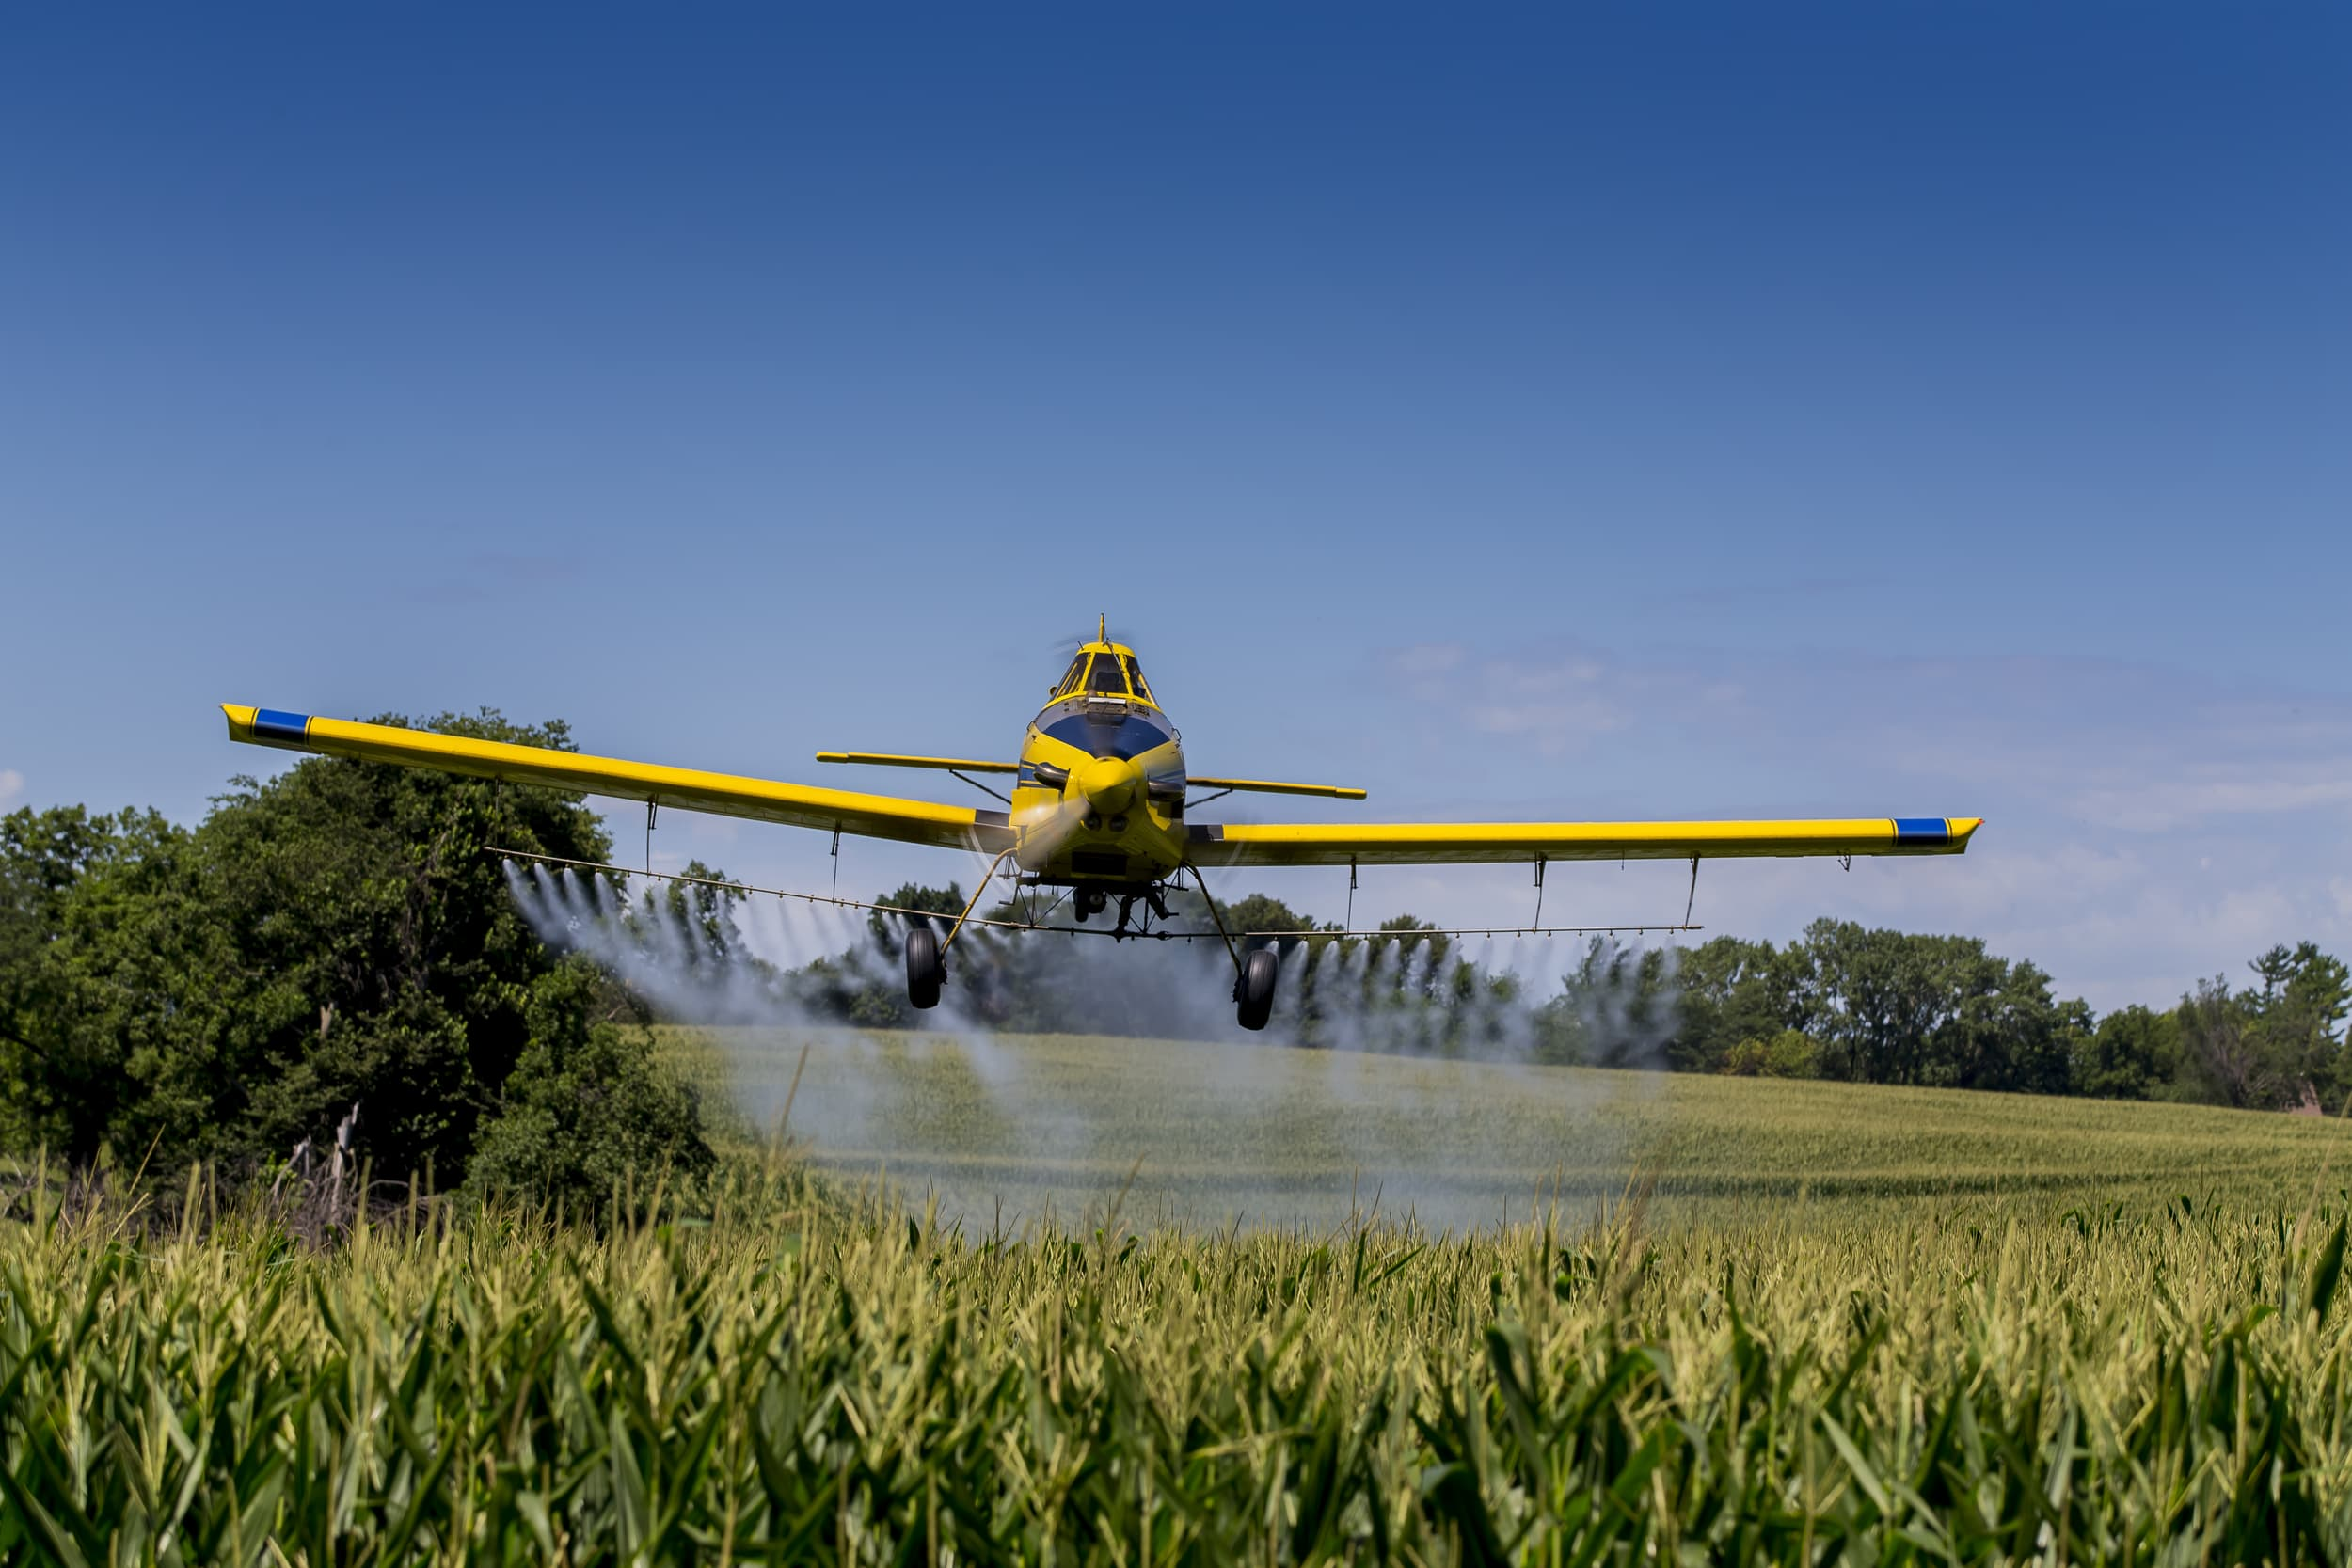 Compliance Training Online Pesticide Handler Safety course